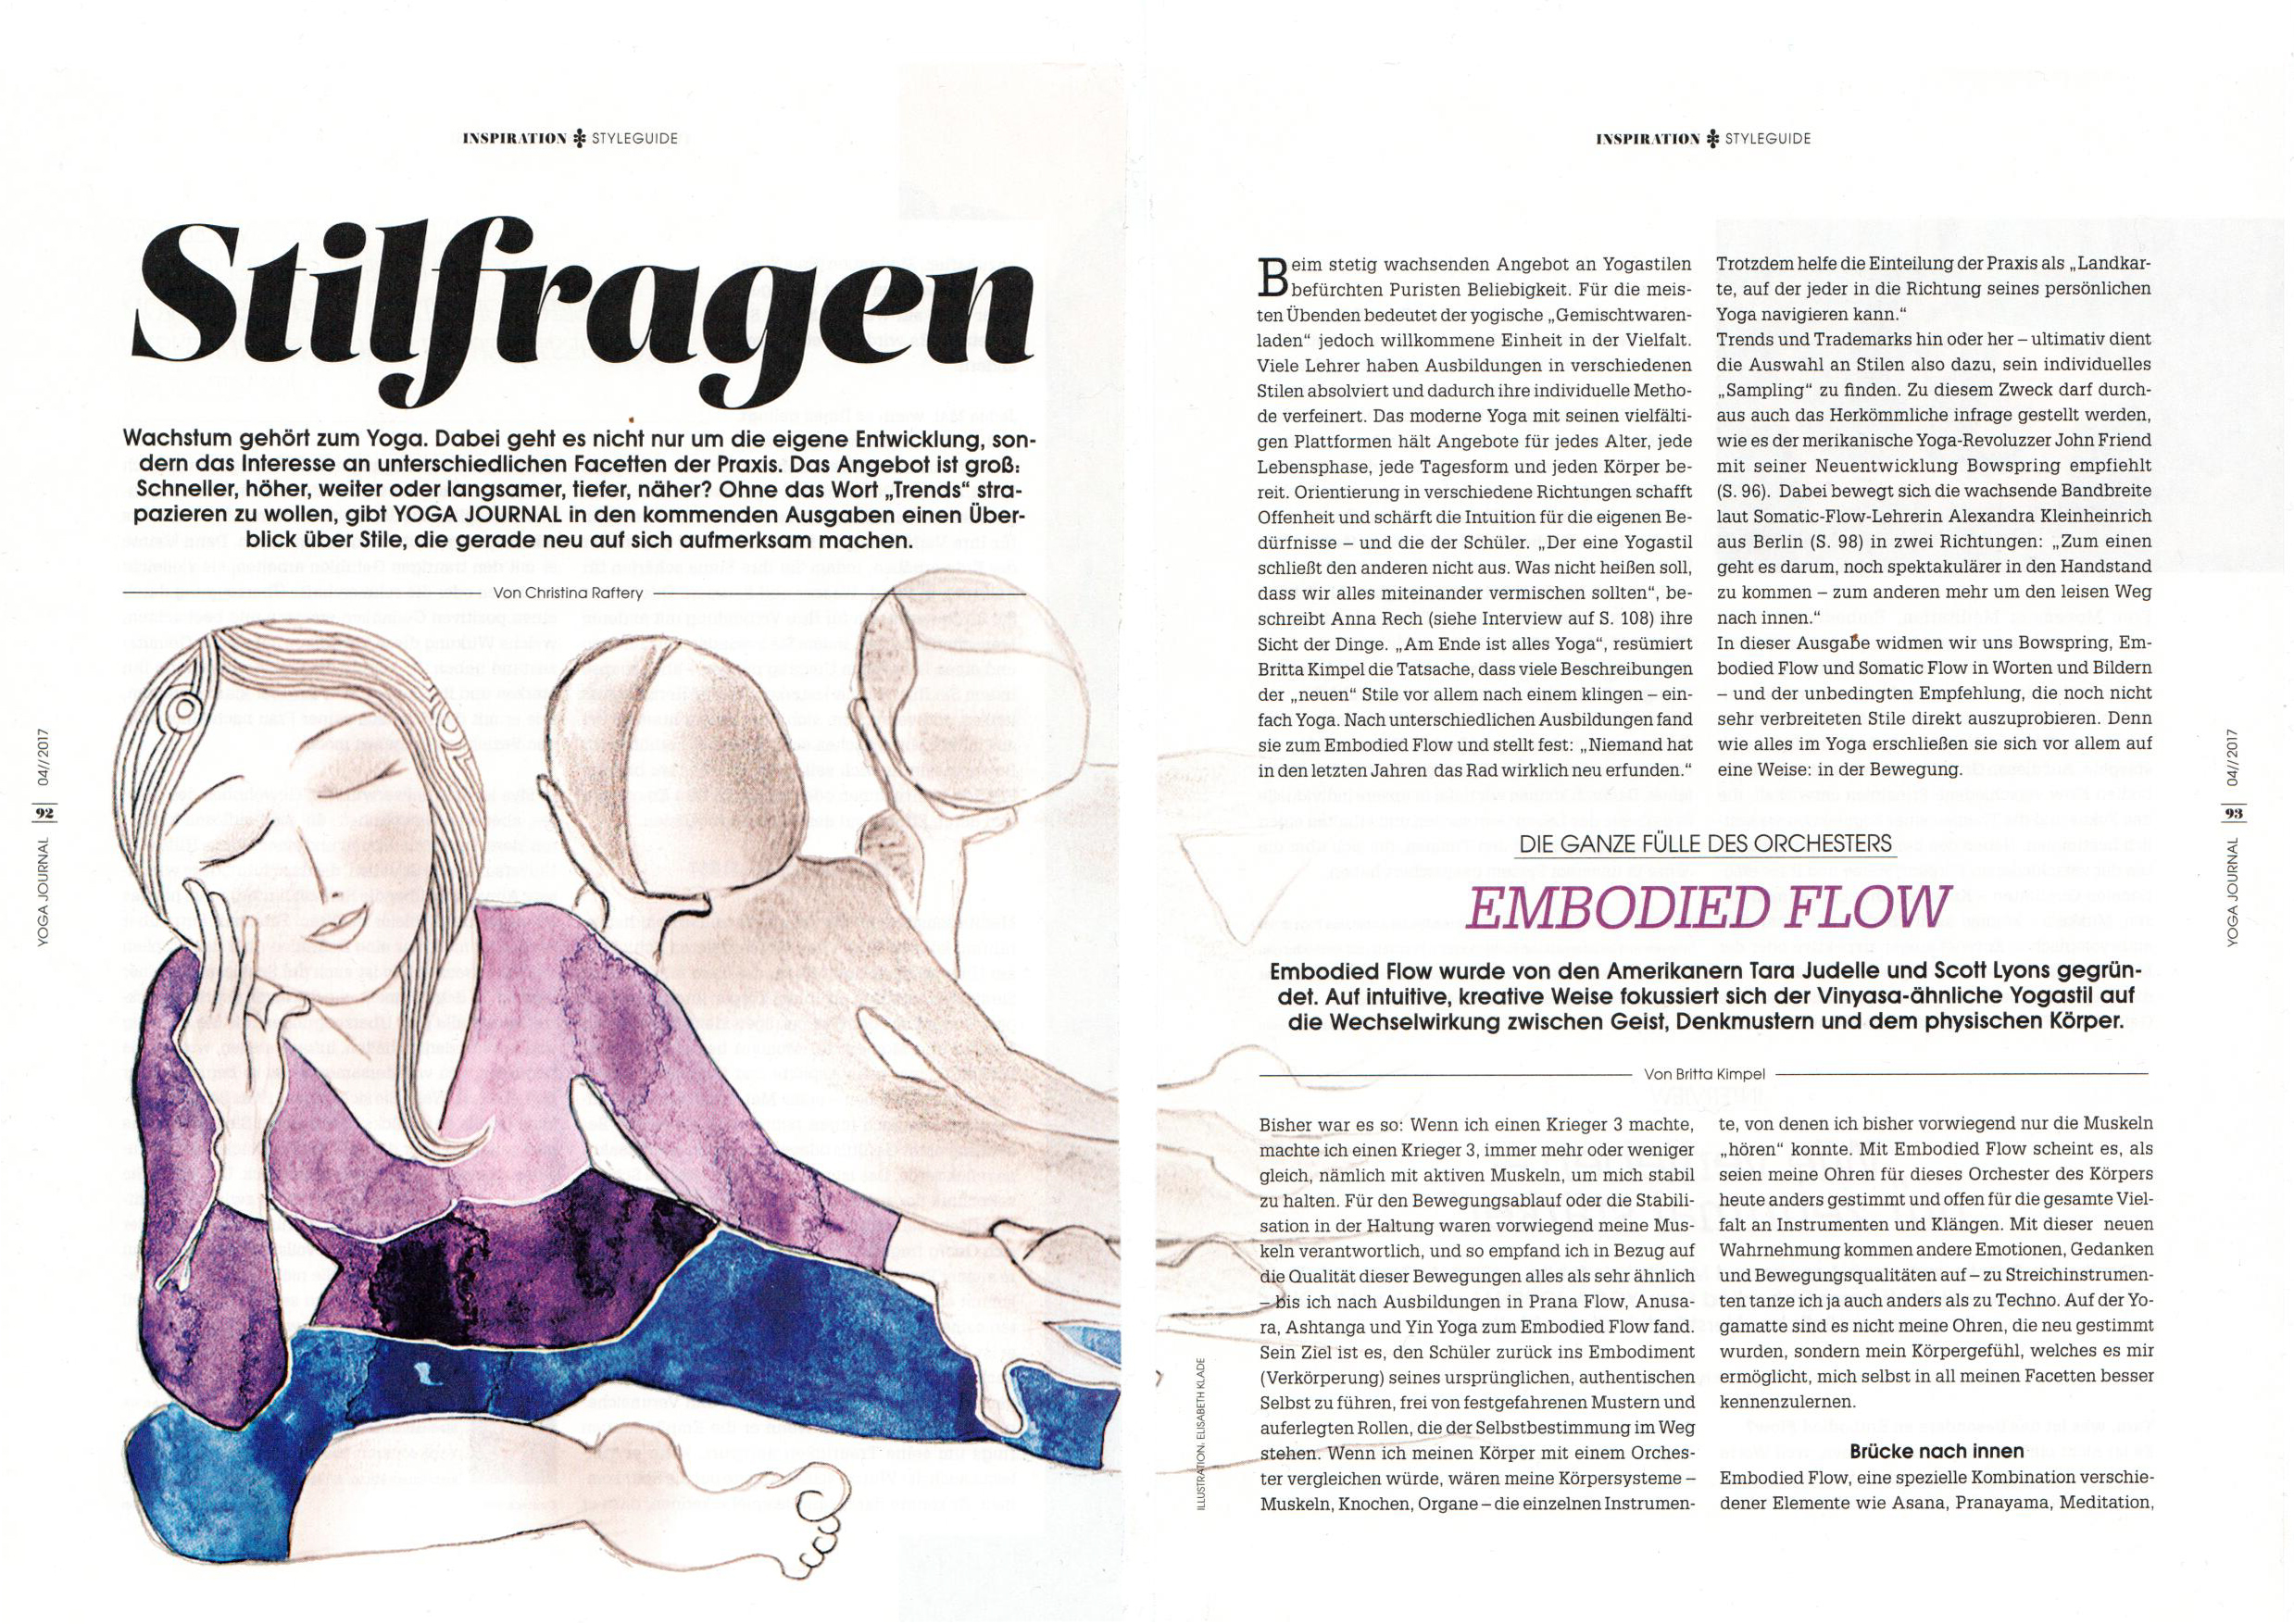 Embodied+Flow+Press+Feature+GERMAN+YOGA+JOURNAL+1.jpg